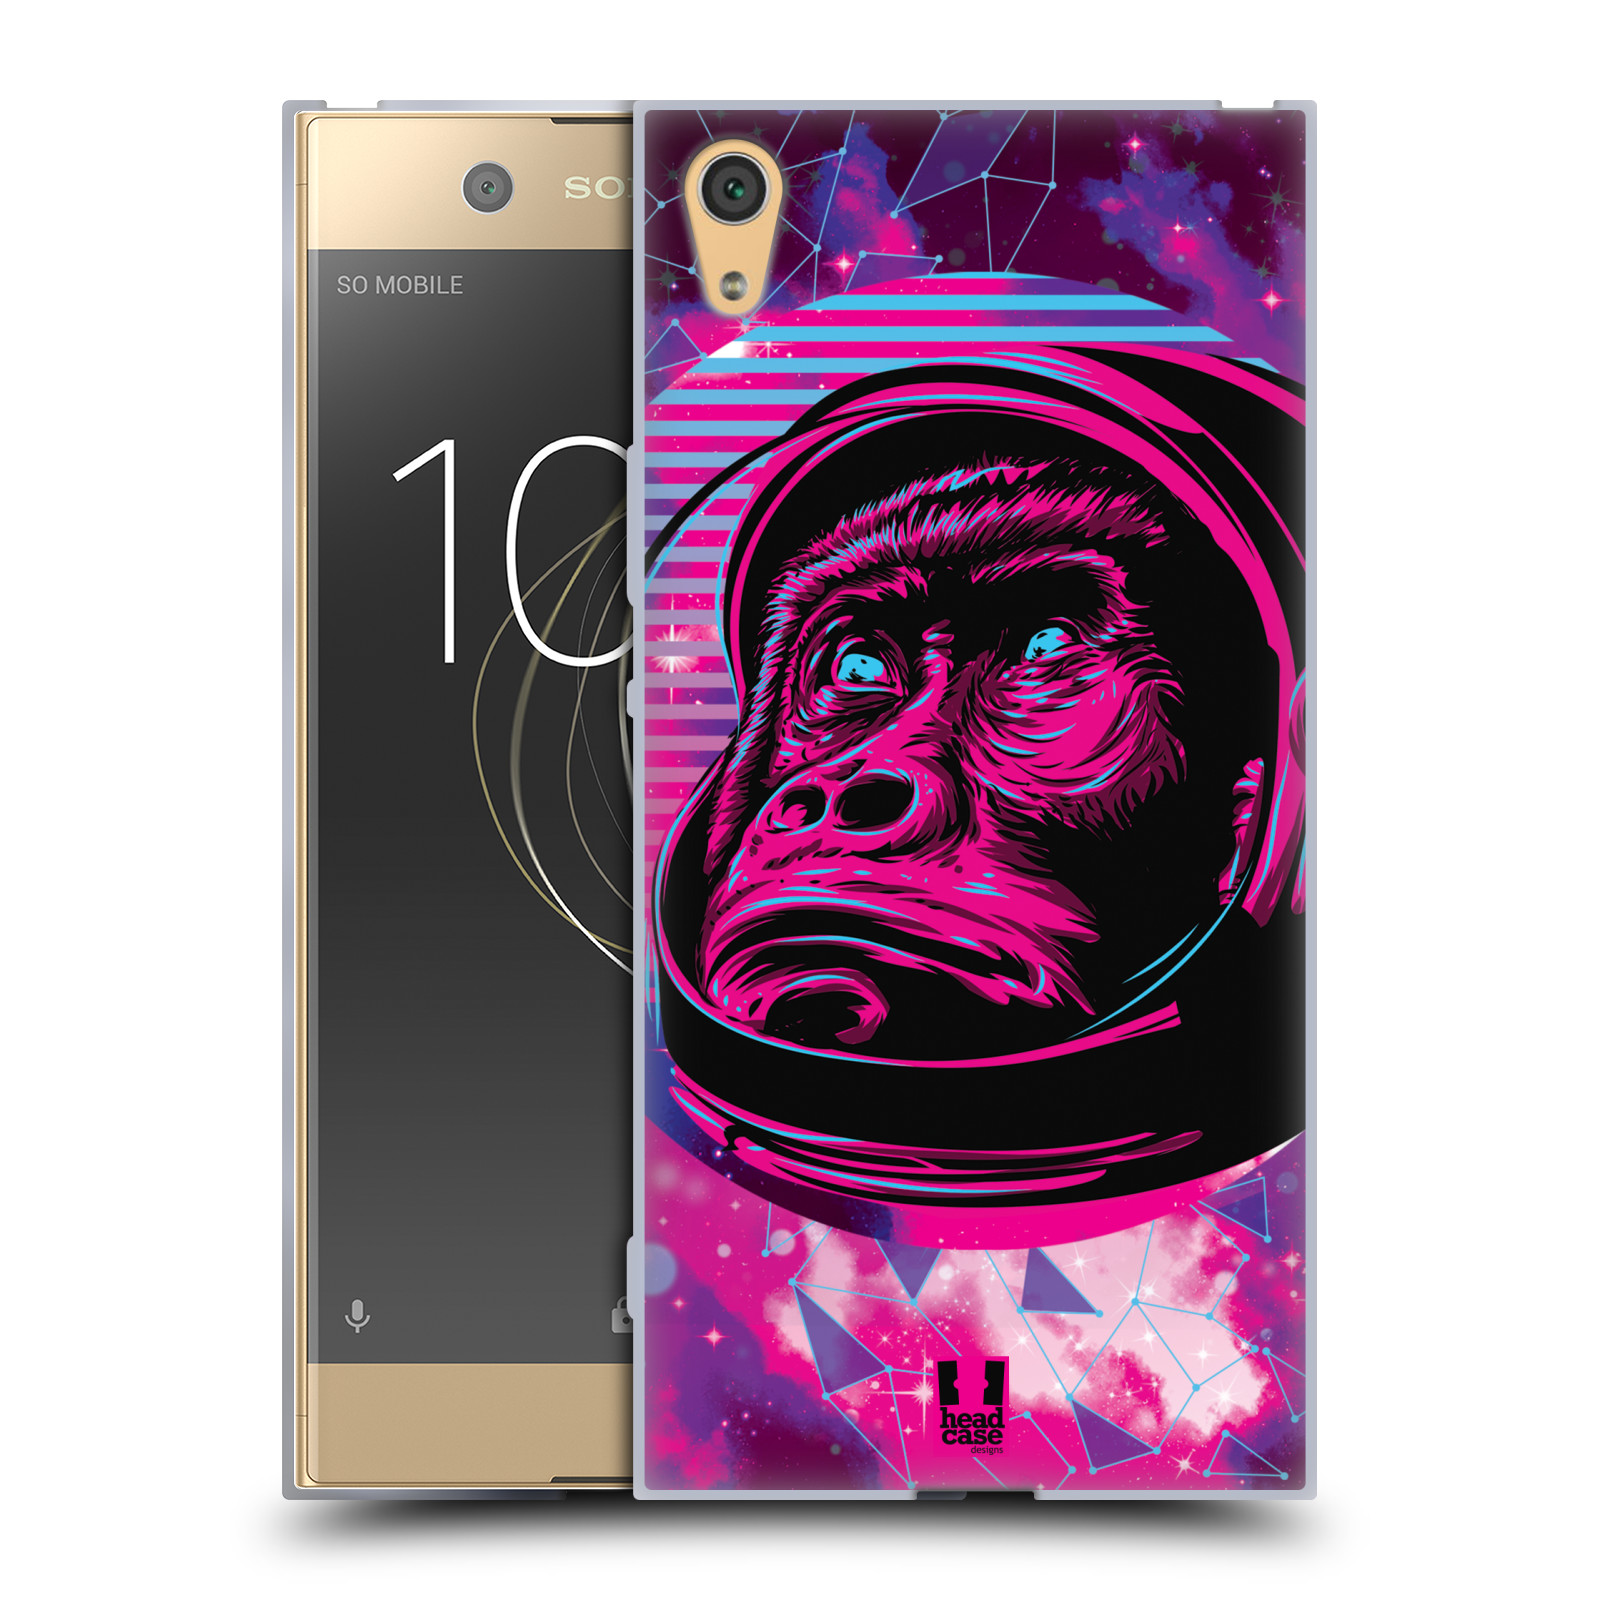 Silikonové pouzdro na mobil Sony Xperia XA1 Ultra - Head Case - Gorila ve skafandru